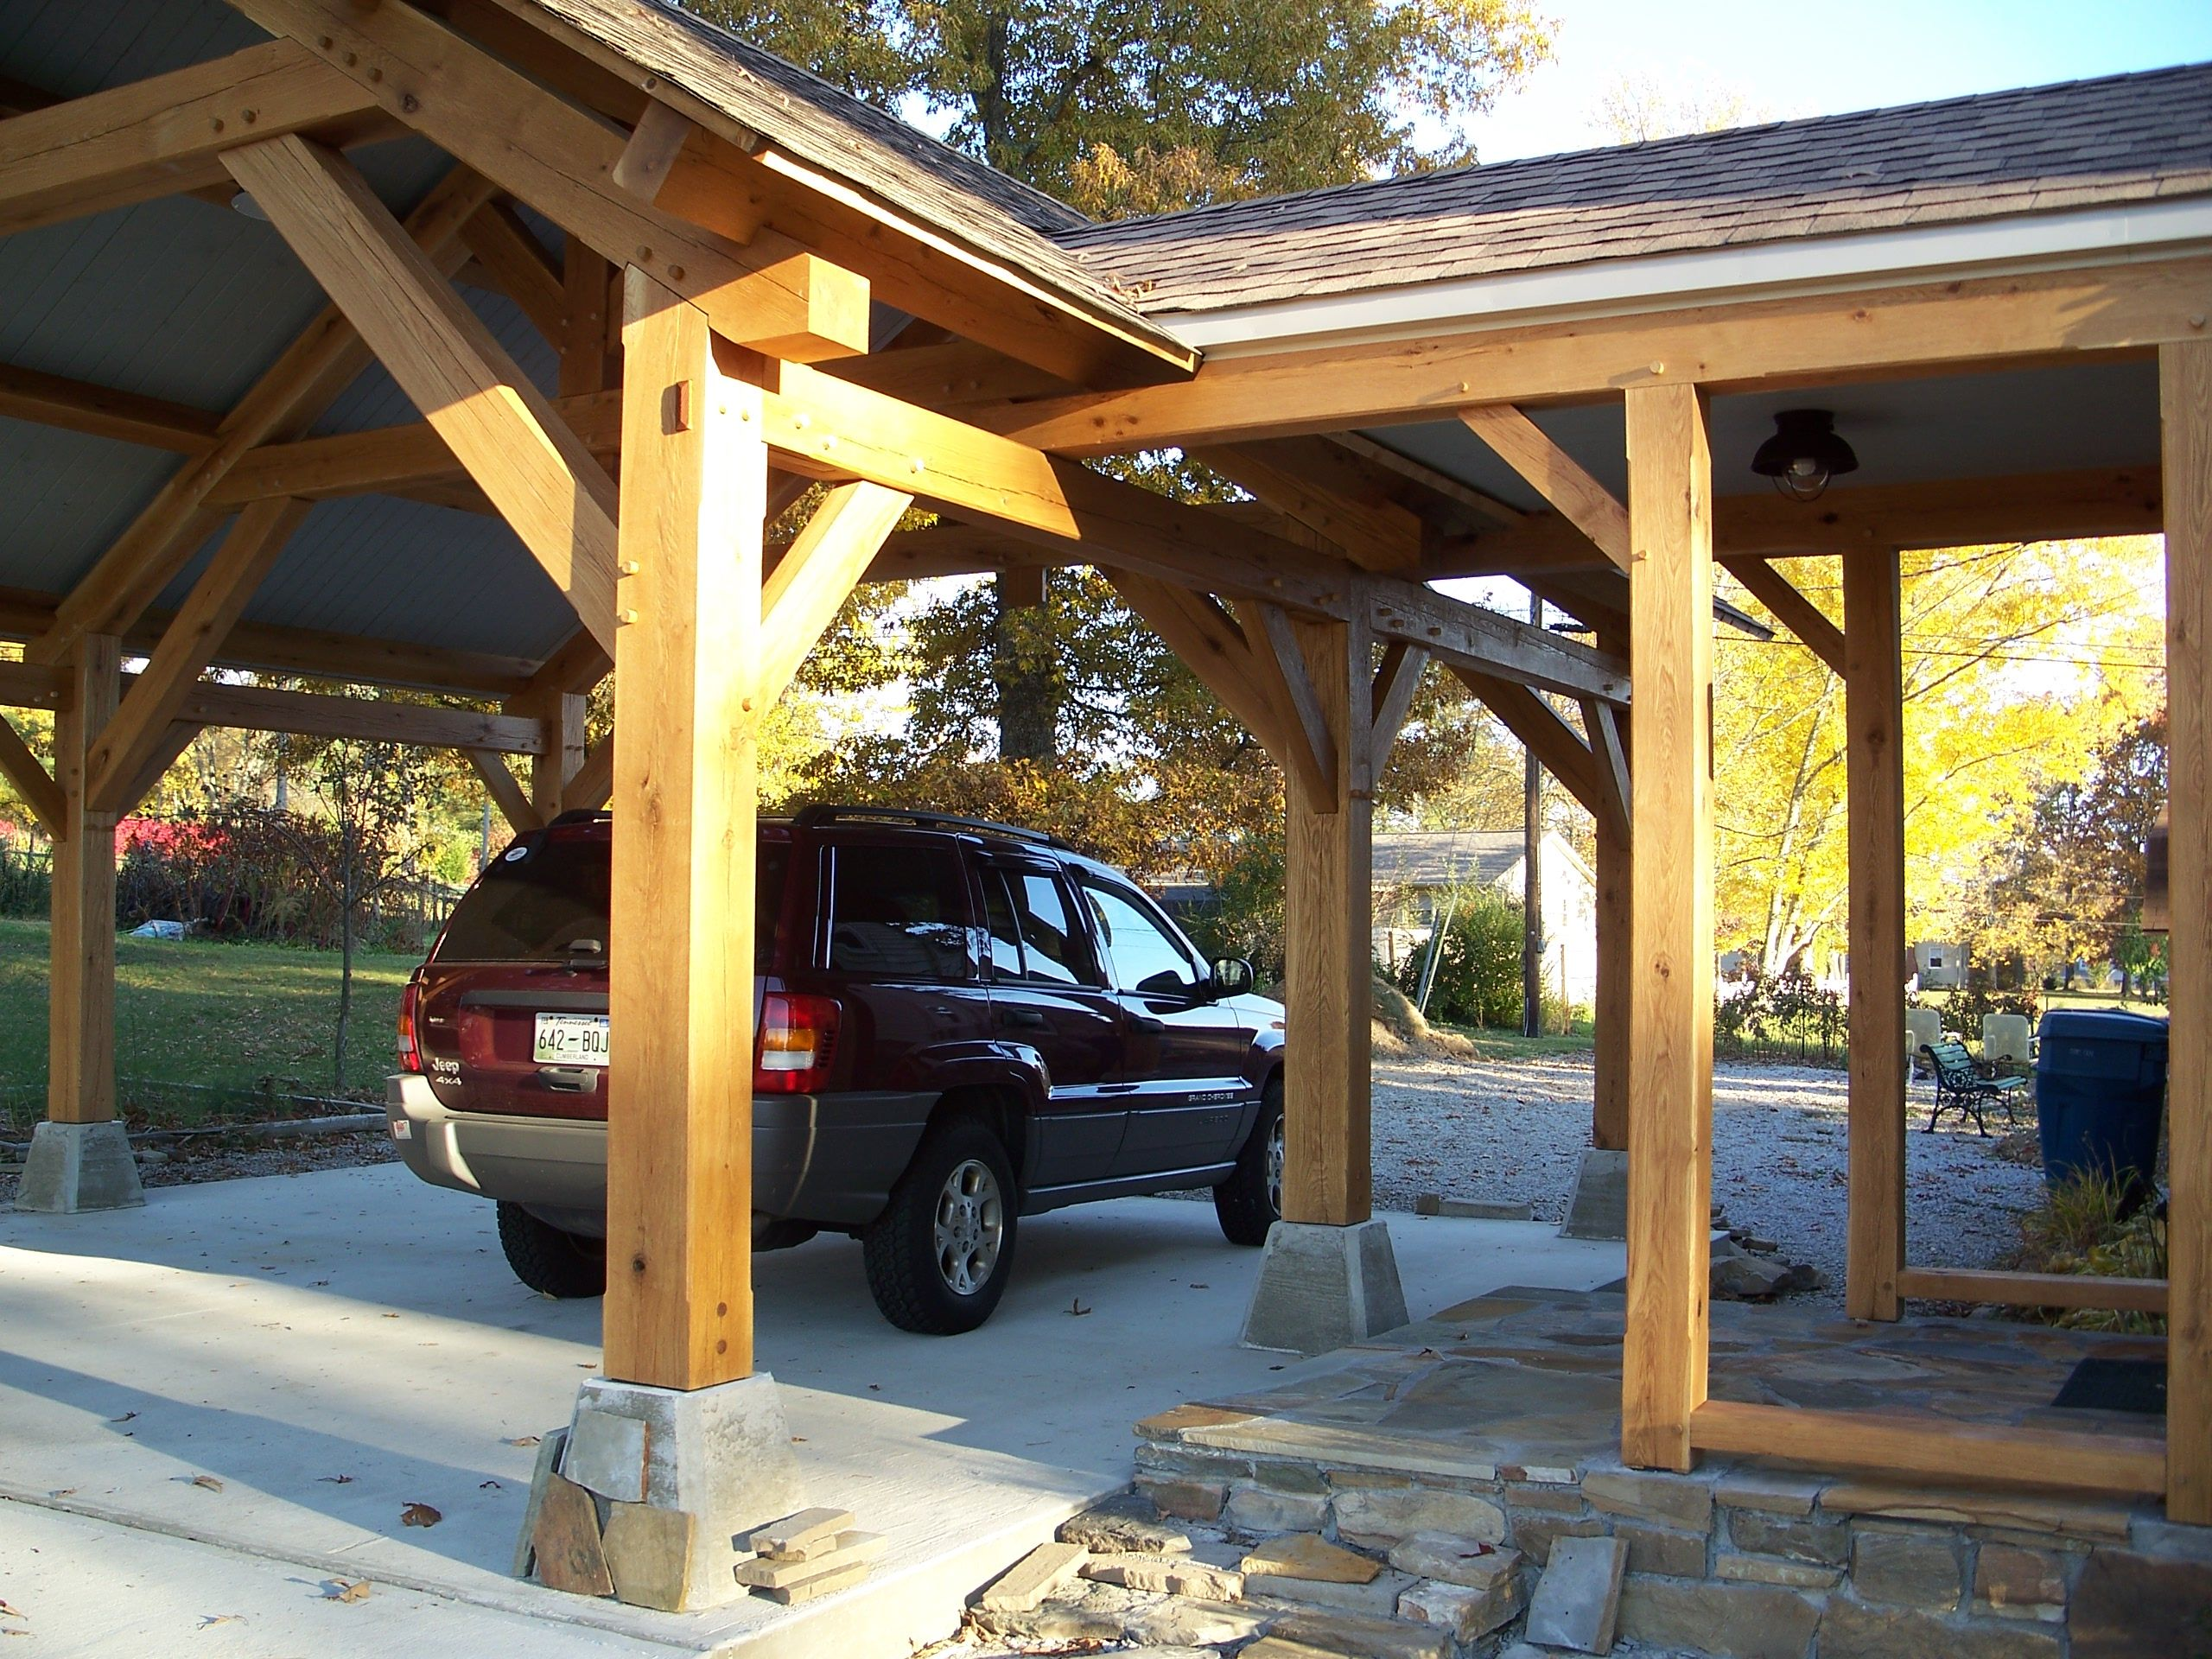 Timber Frames Homestead Timber Frames Crossville Tn Timber Framing Timber Frame Pavilion Backyard Buildings